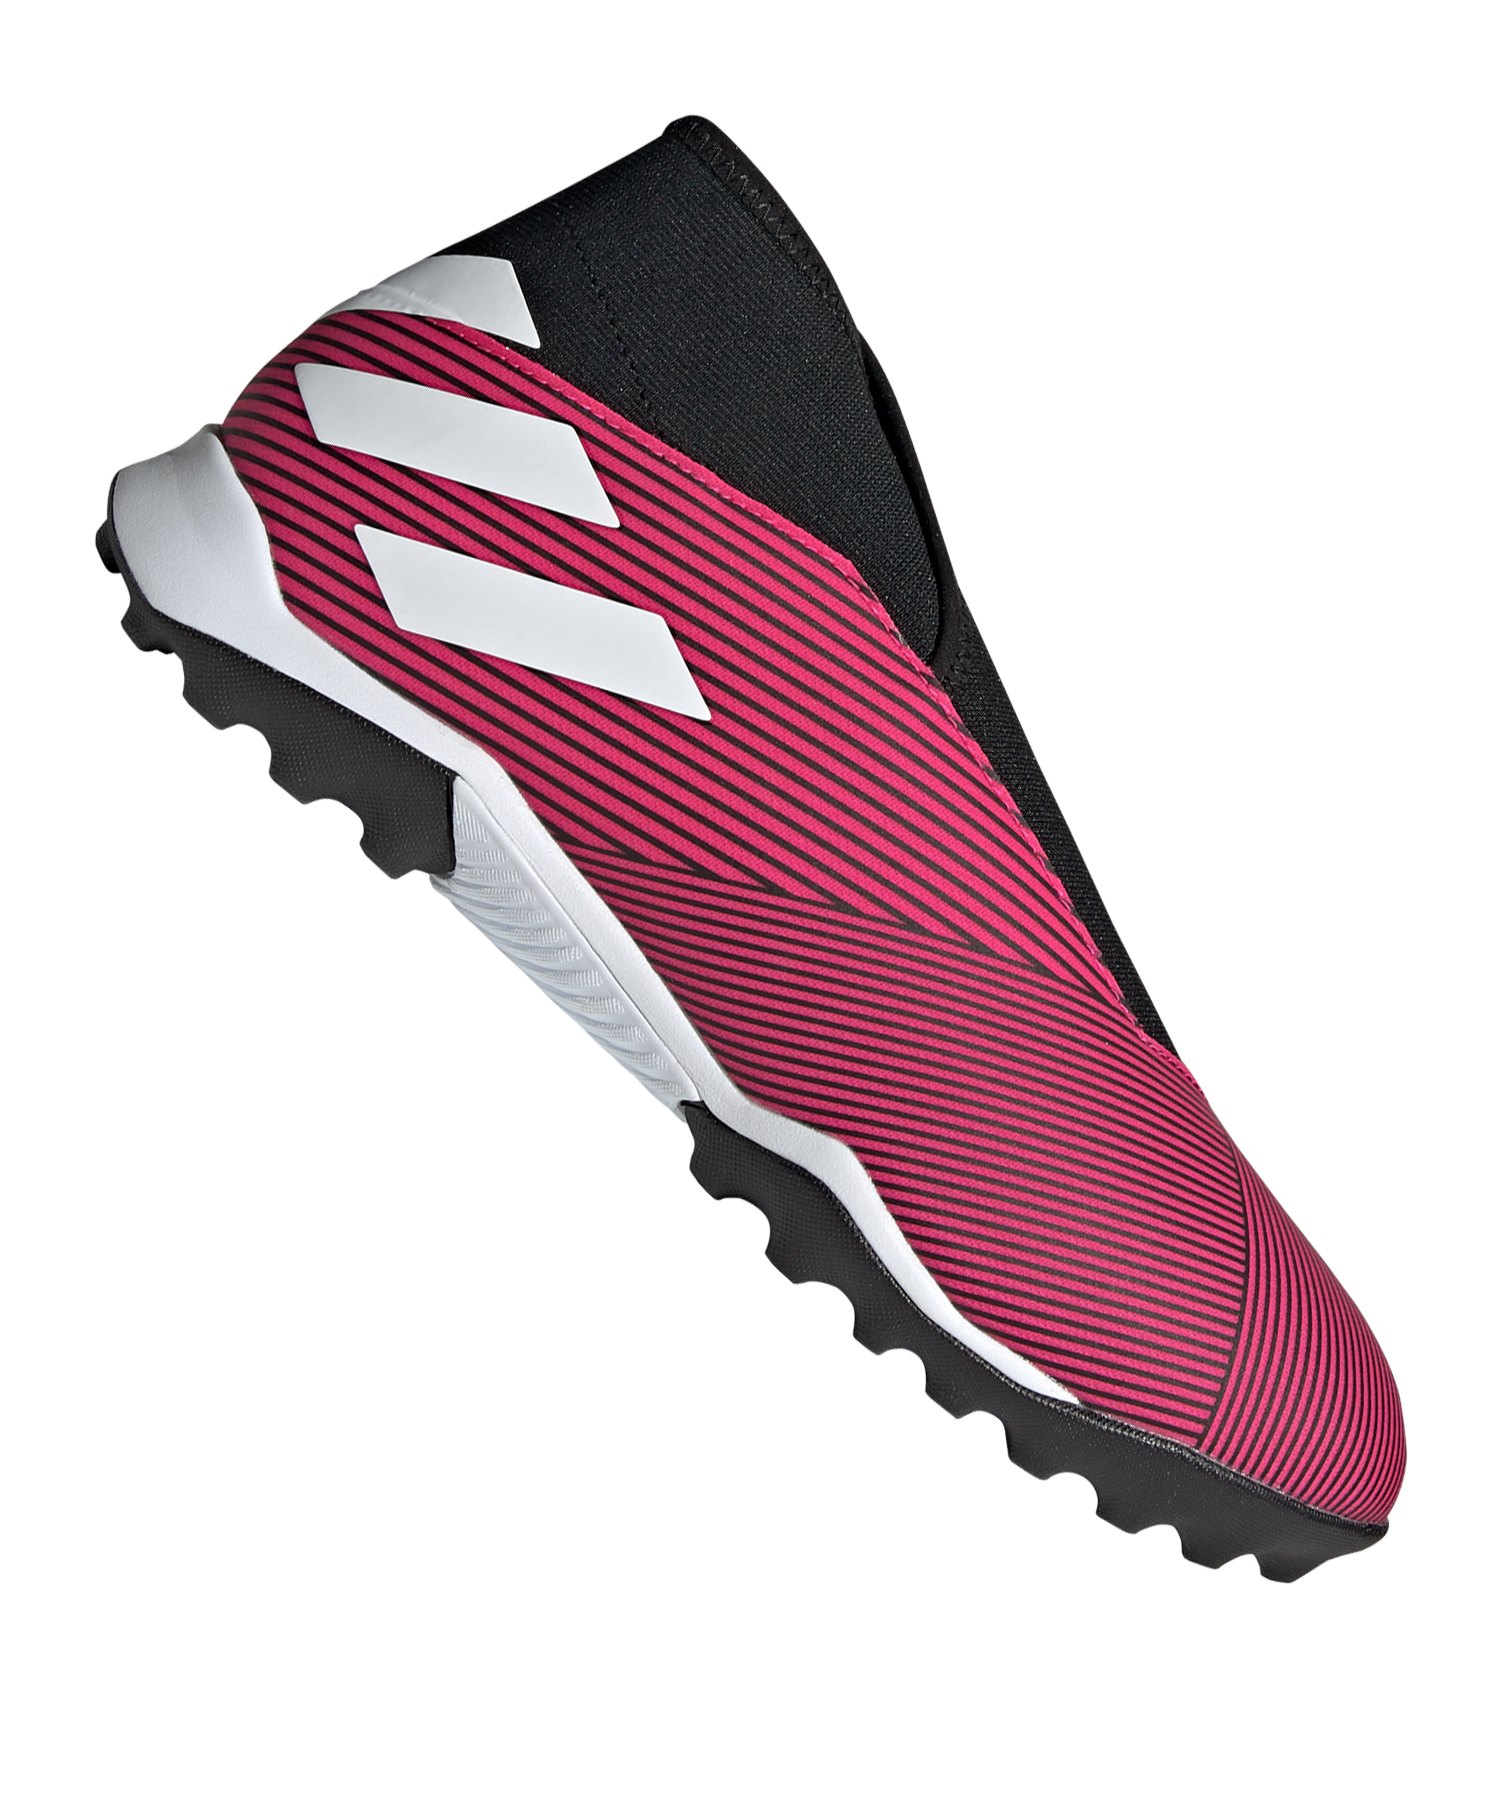 adidas NEMEZIZ 19.3 LL TF Pink - pink